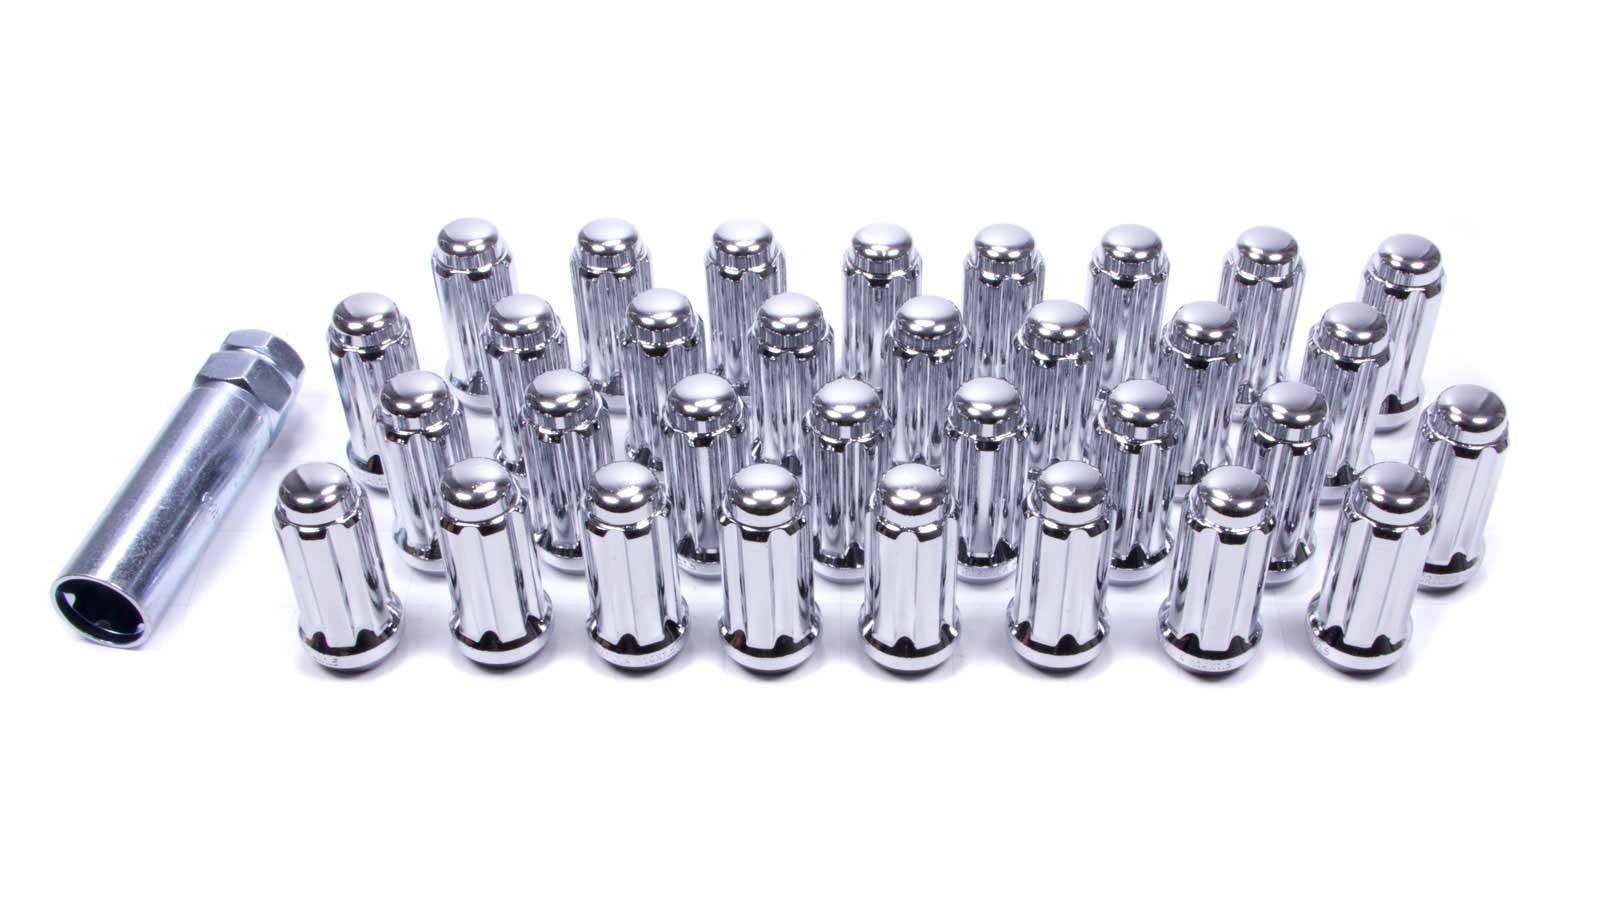 Gorilla 14mm x 1.50 8 Lug Kit Chrome